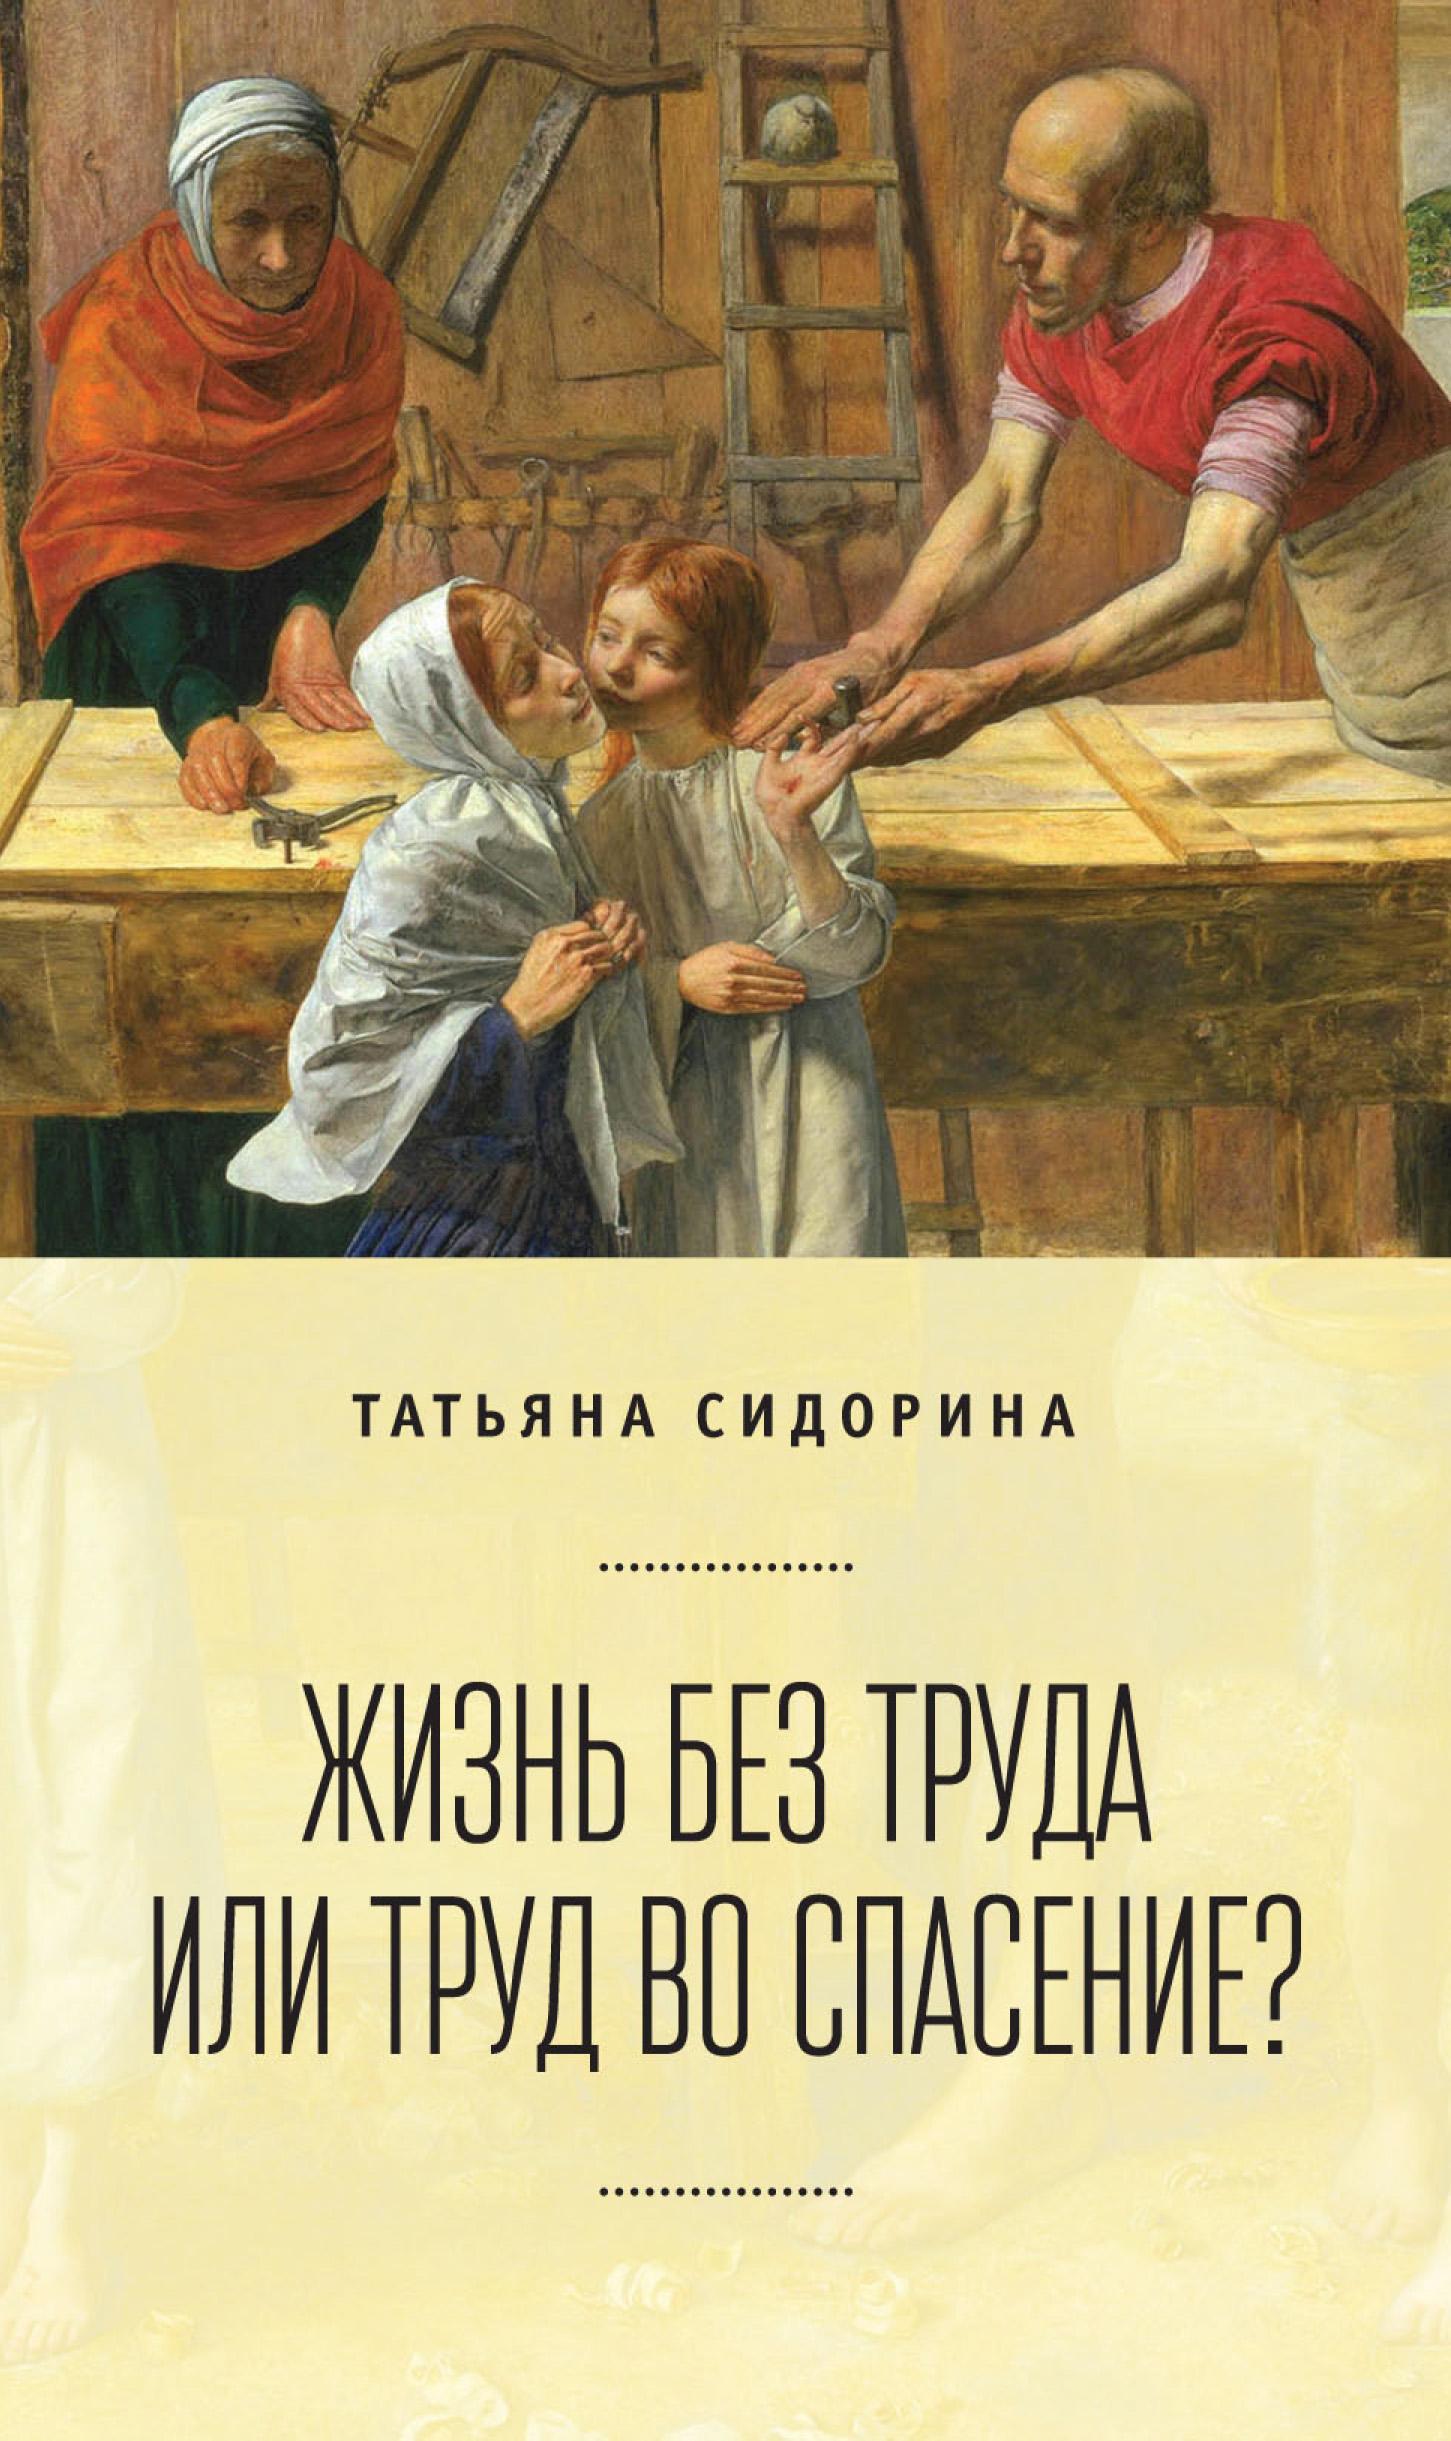 все цены на Татьяна Сидорина Жизнь без труда или труд во спасение? онлайн